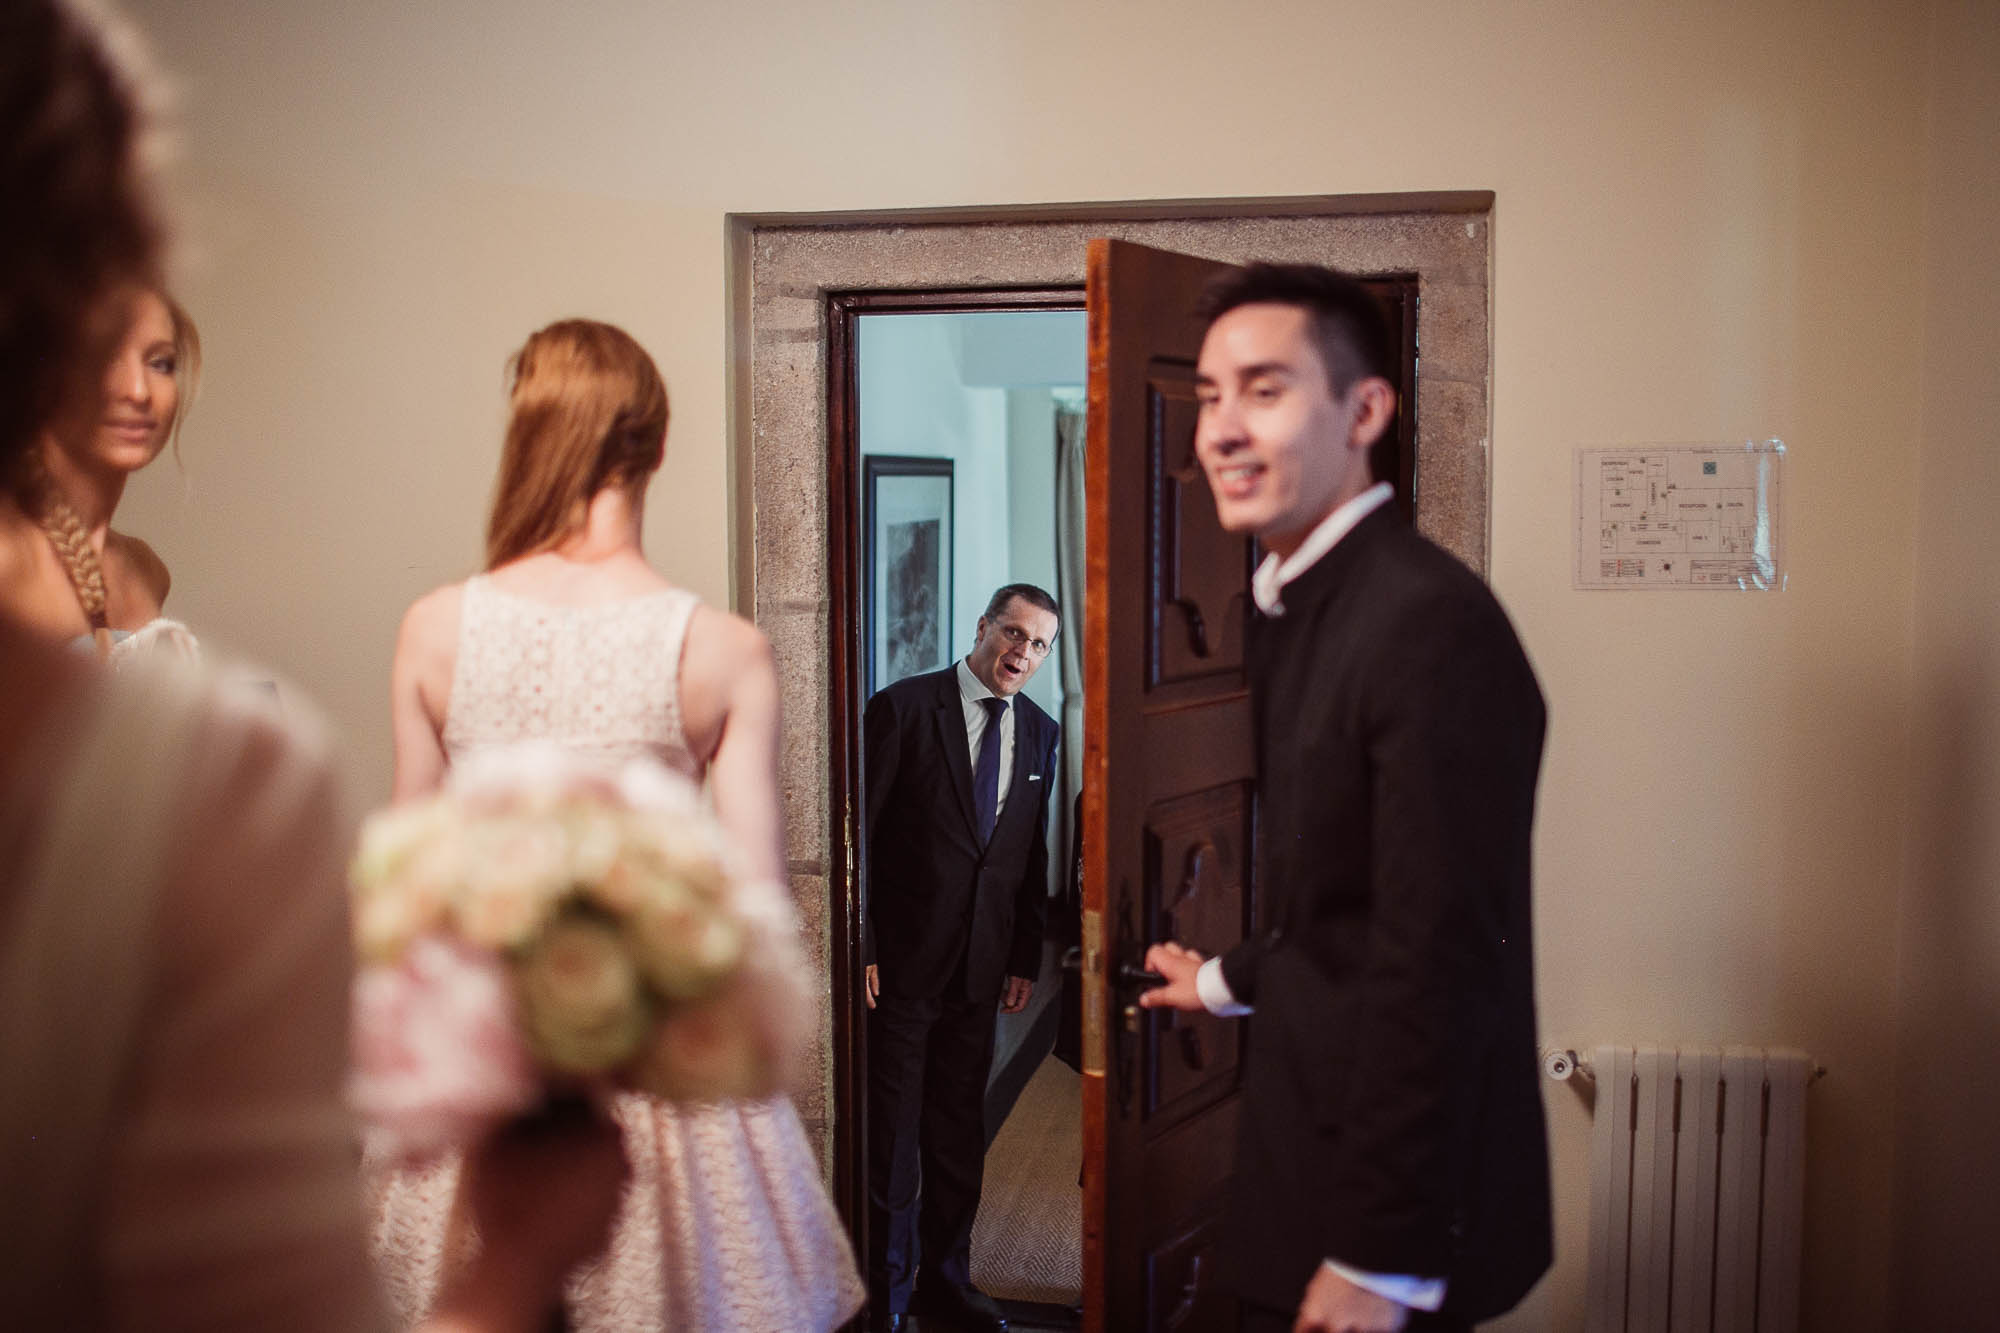 El padre espera a la novia al otro lado de la puerta para acompañarla al altar